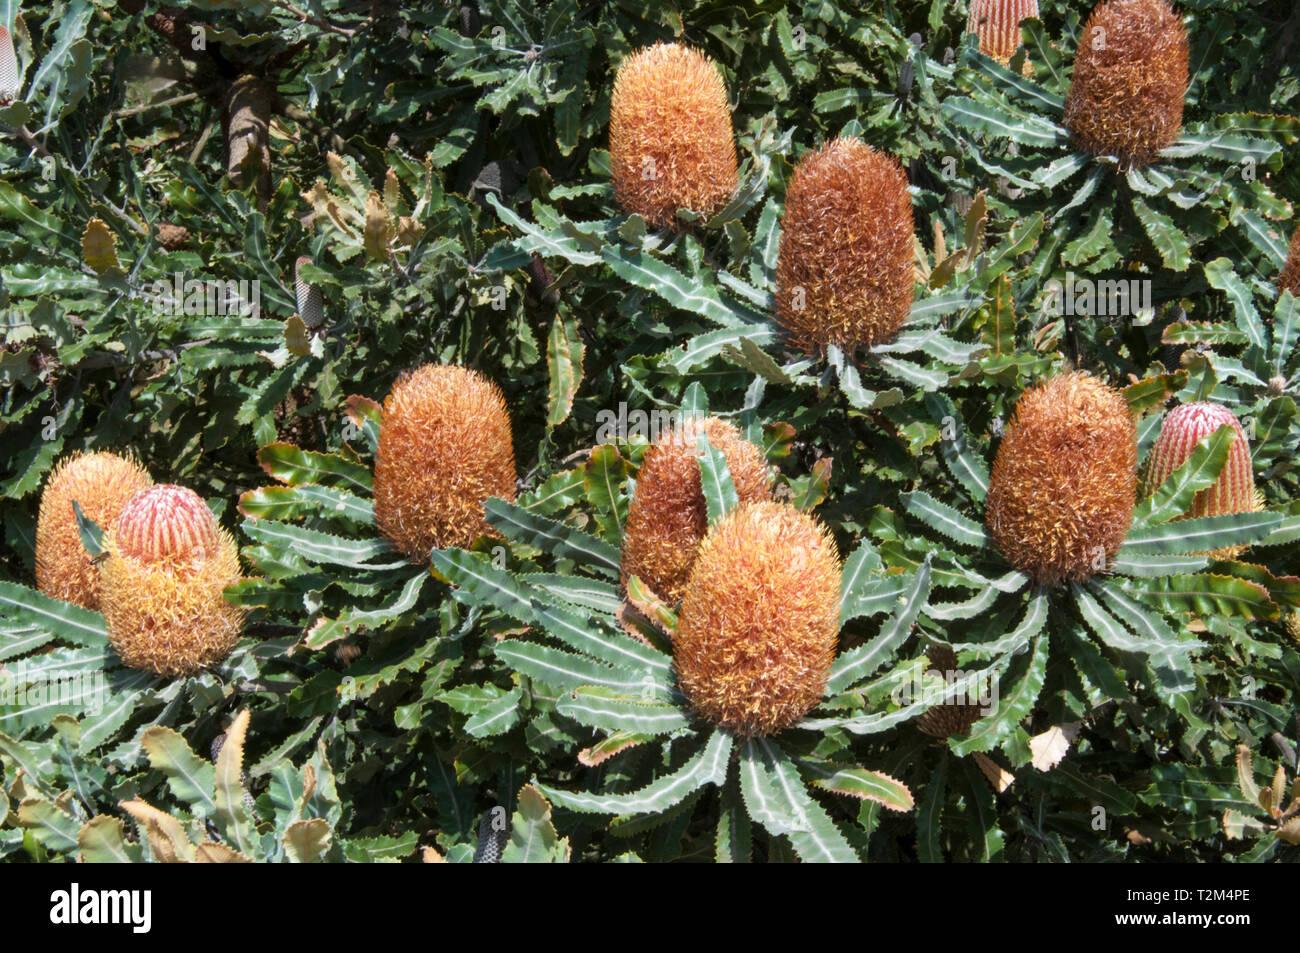 Menzies Banksia, Banksia menziesii or Firewood Banksia at the Australian Garden, Cranbourne, Victoria Stock Photo